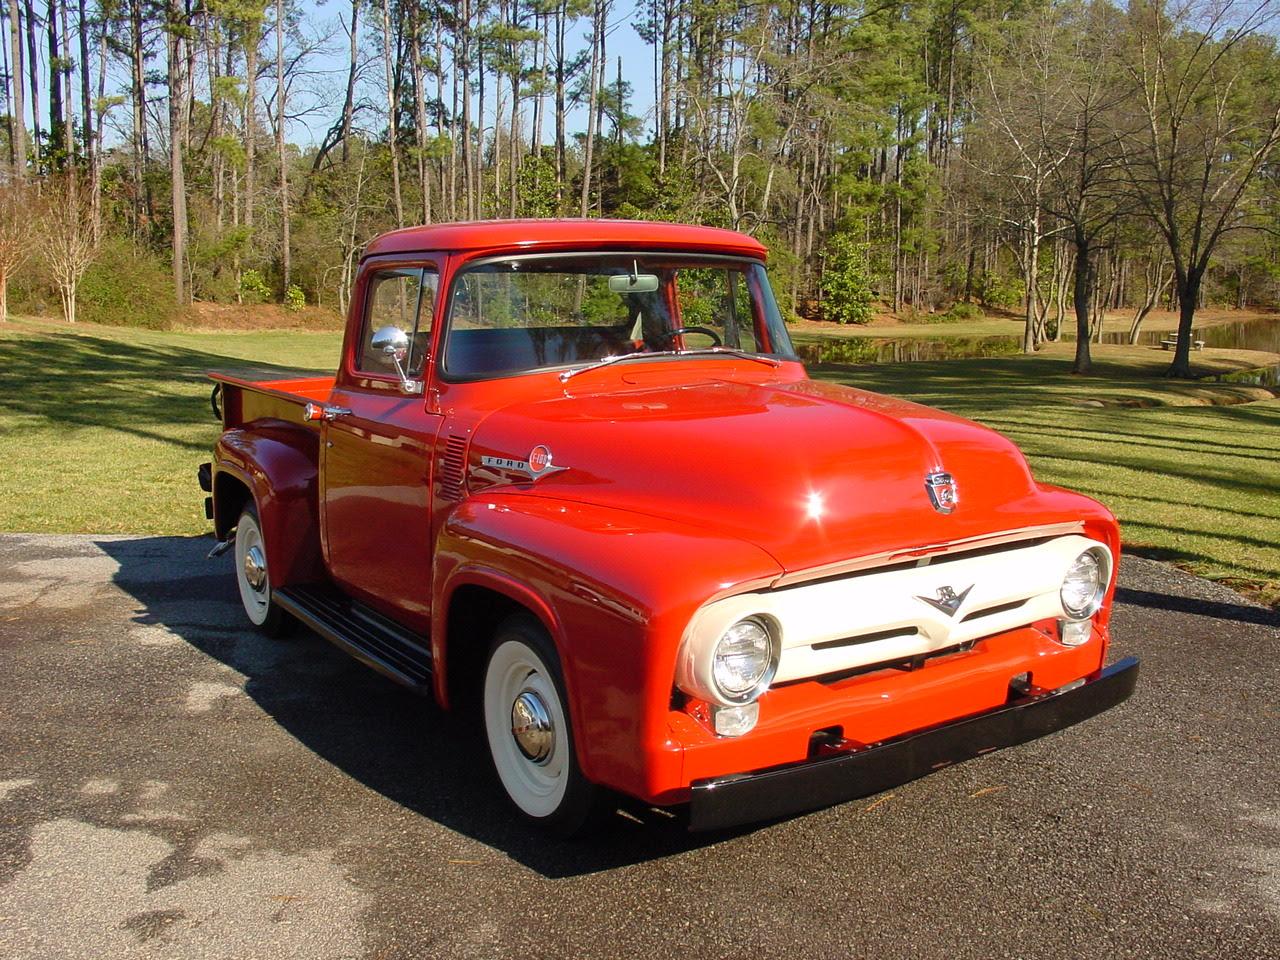 Kampat Show Buzz Gallardo Black Yellow Lip Rims 1954 Ford F100 Pick Up 56 Pickup